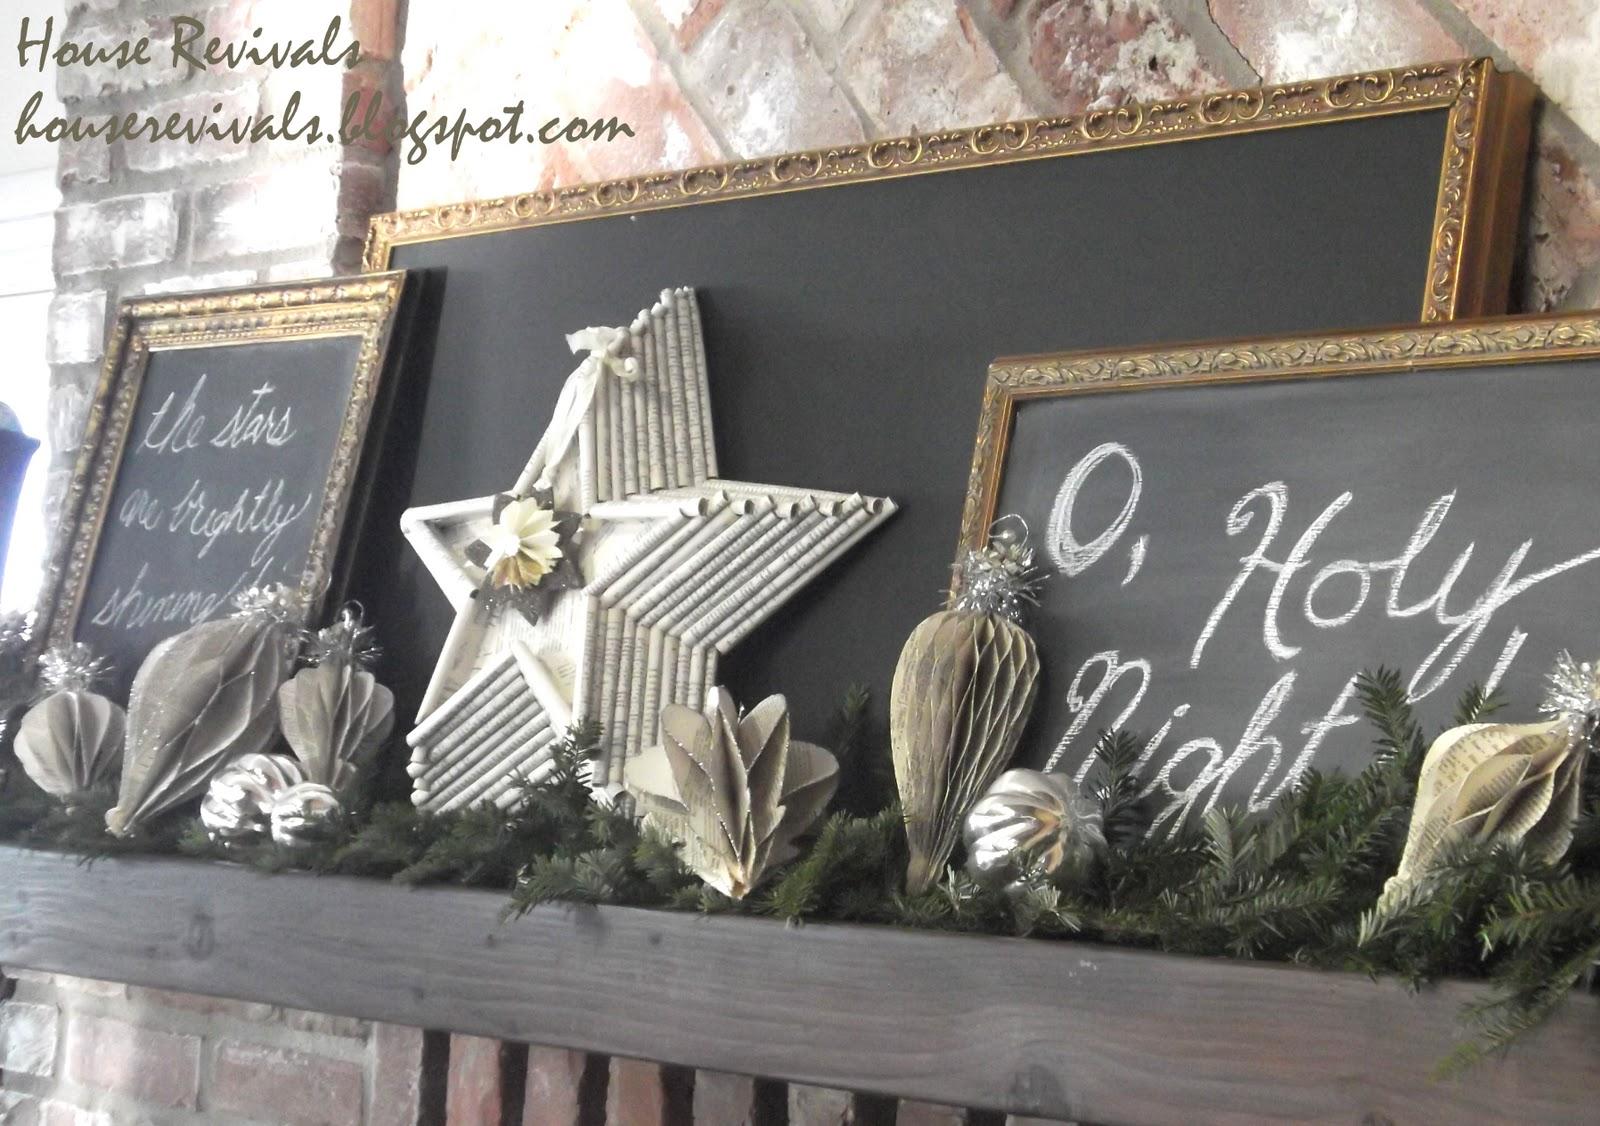 House Revivals Christmas Mantel and Beach House Tour 2011